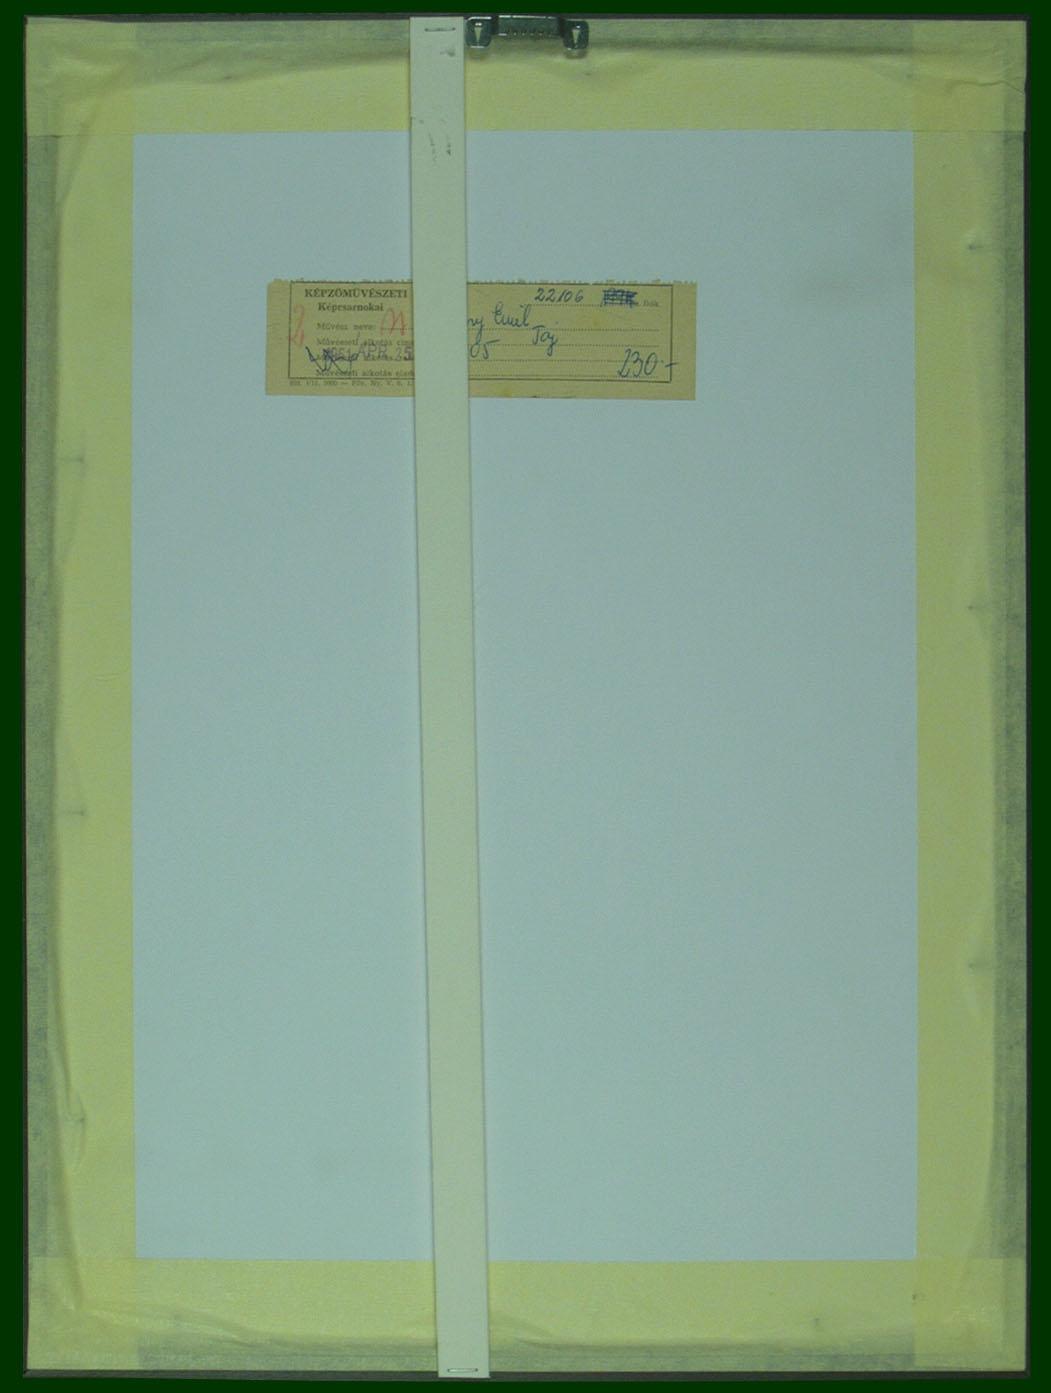 97-26hat.JPG (1051×1393)